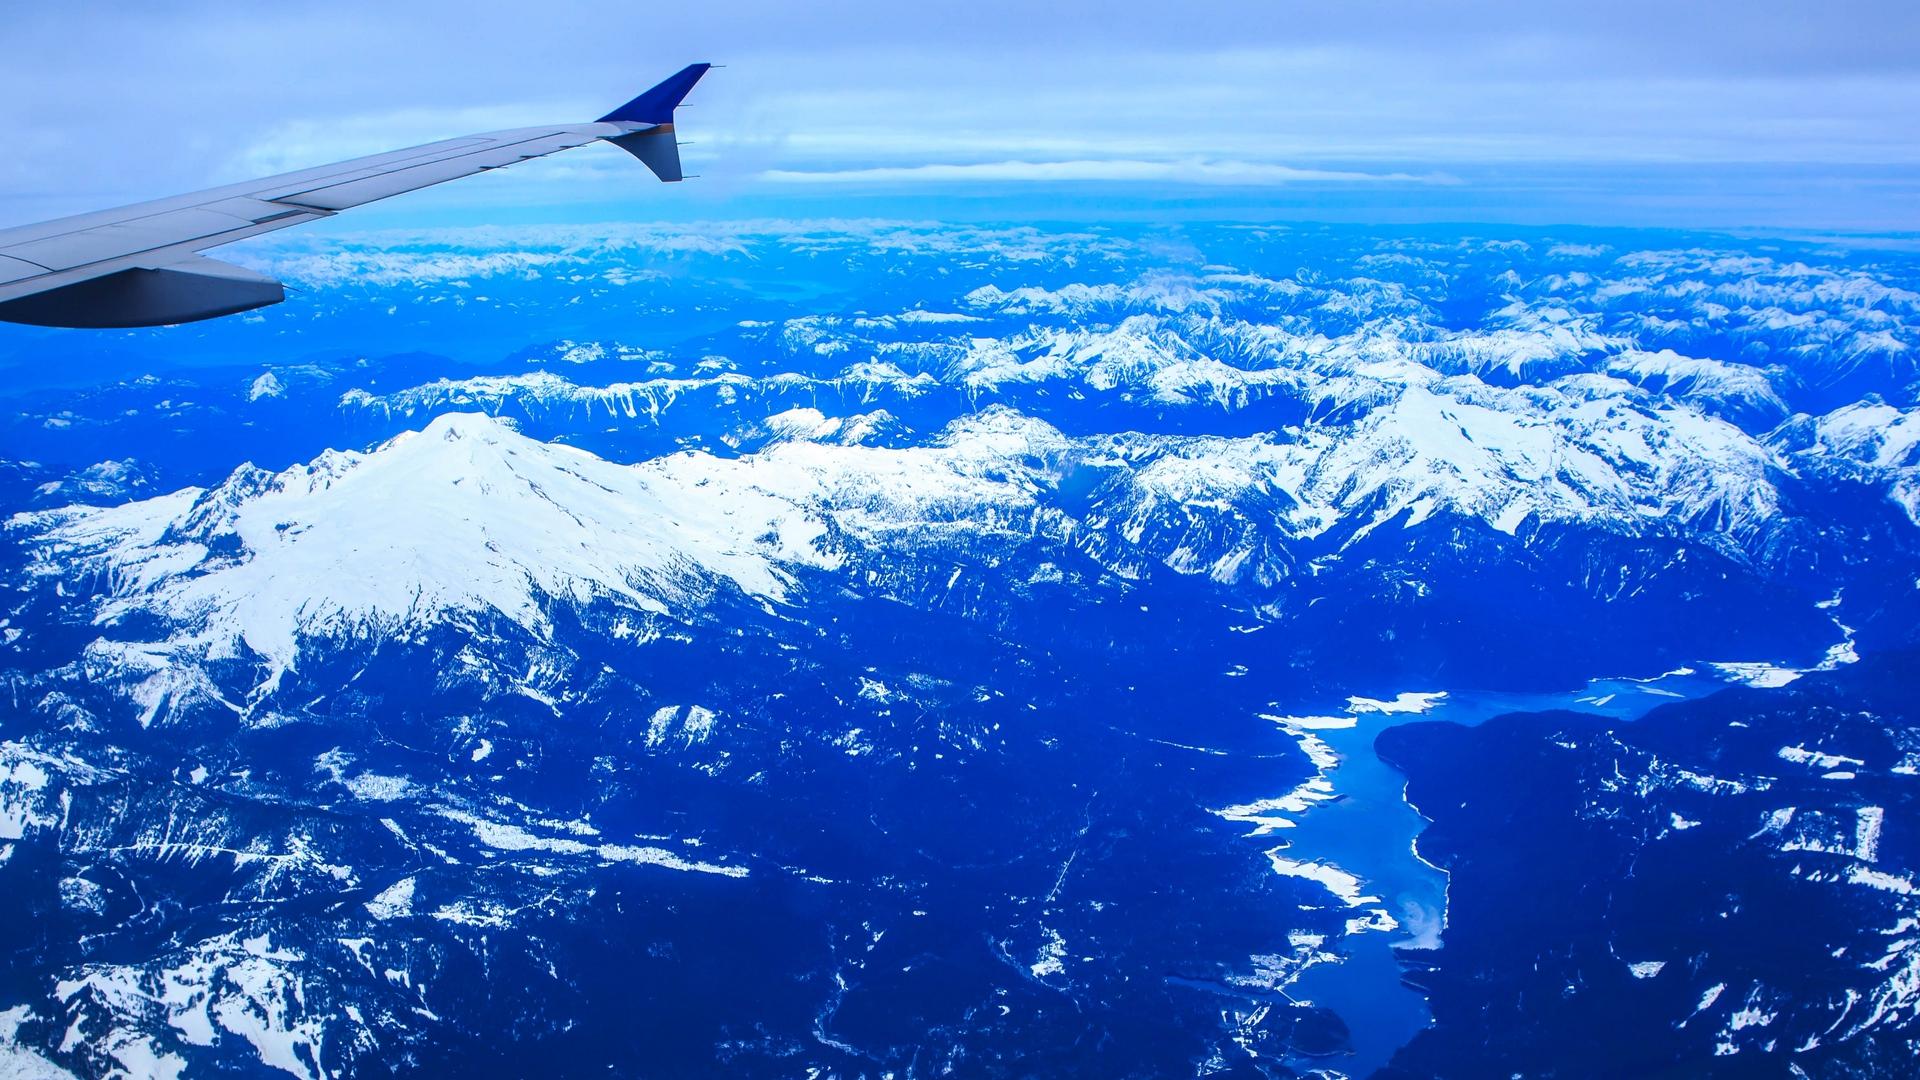 General 1920x1080 airplane airplane wing mountains peak Washington USA blue snowy peak